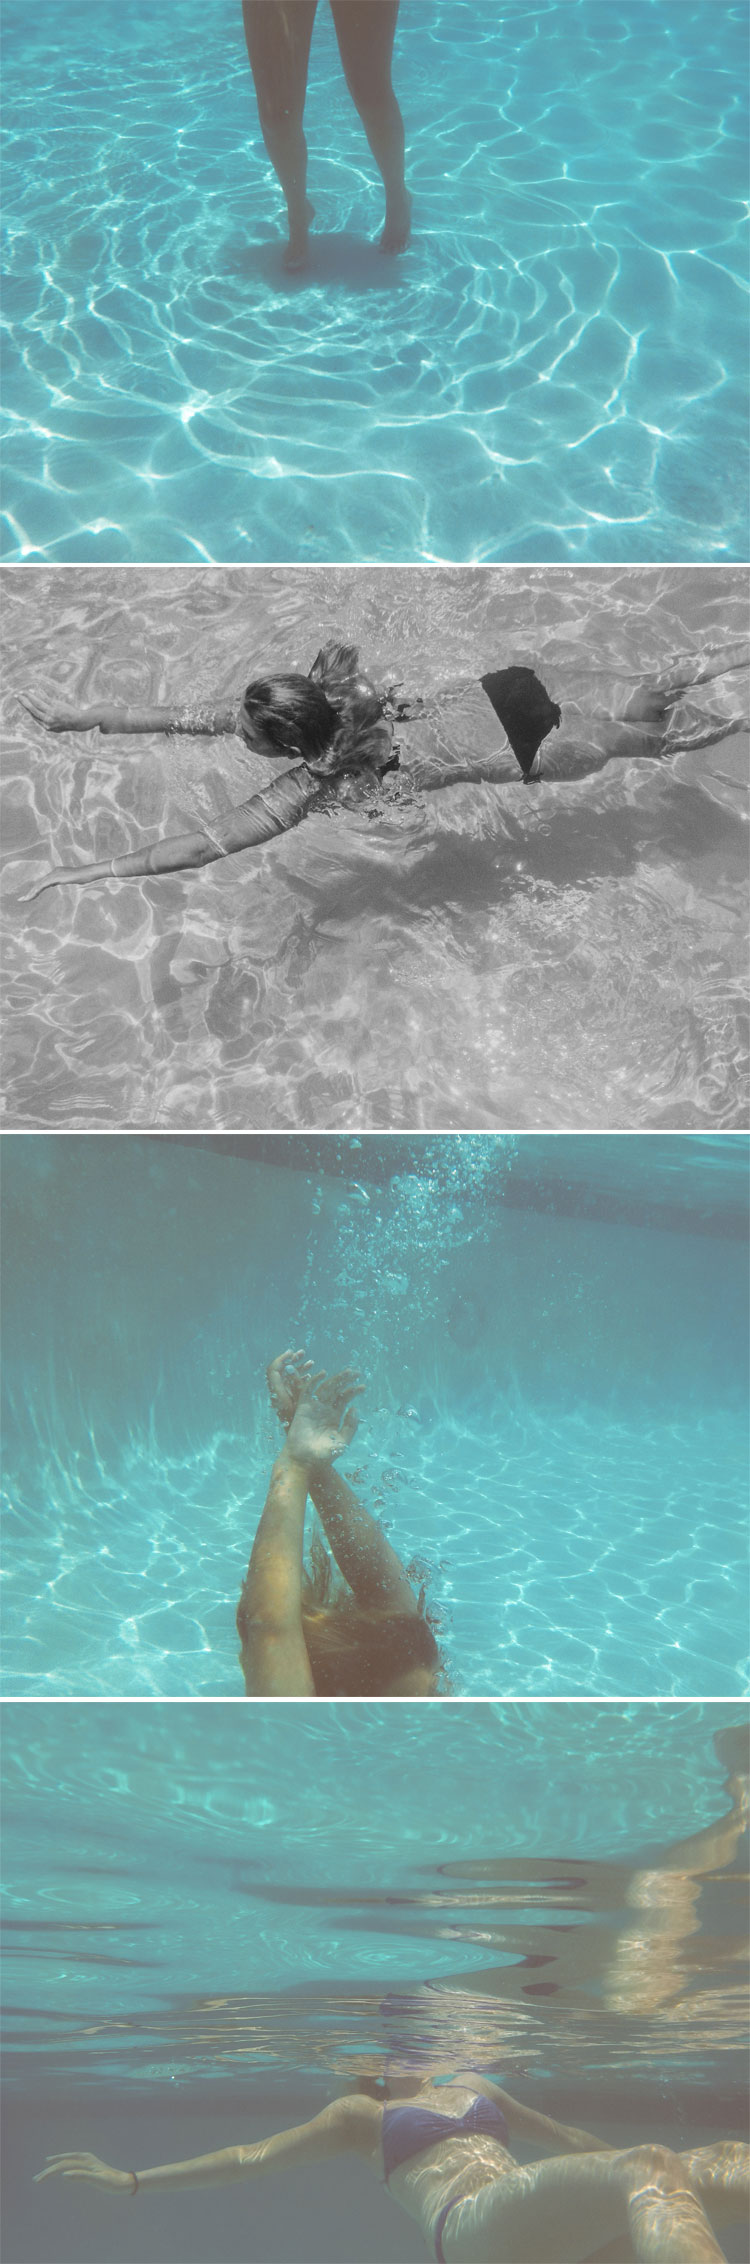 Water-Florida-2